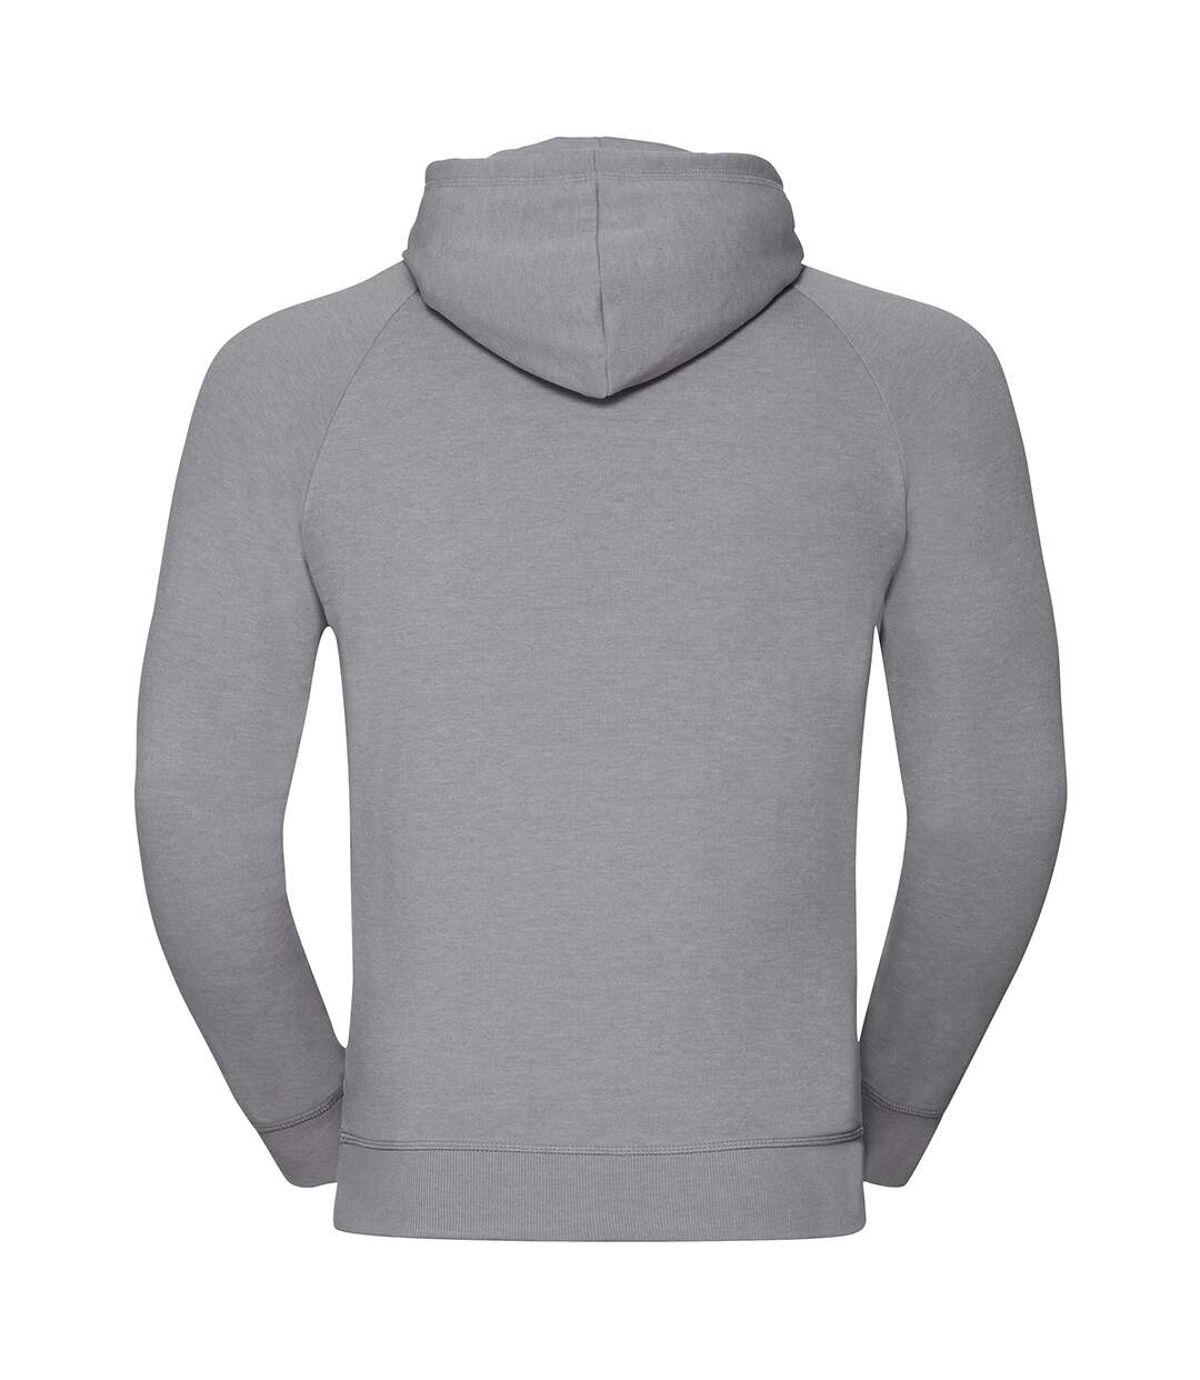 Russell Mens HD Hooded Sweatshirt (Silver Marl) - UTRW5504